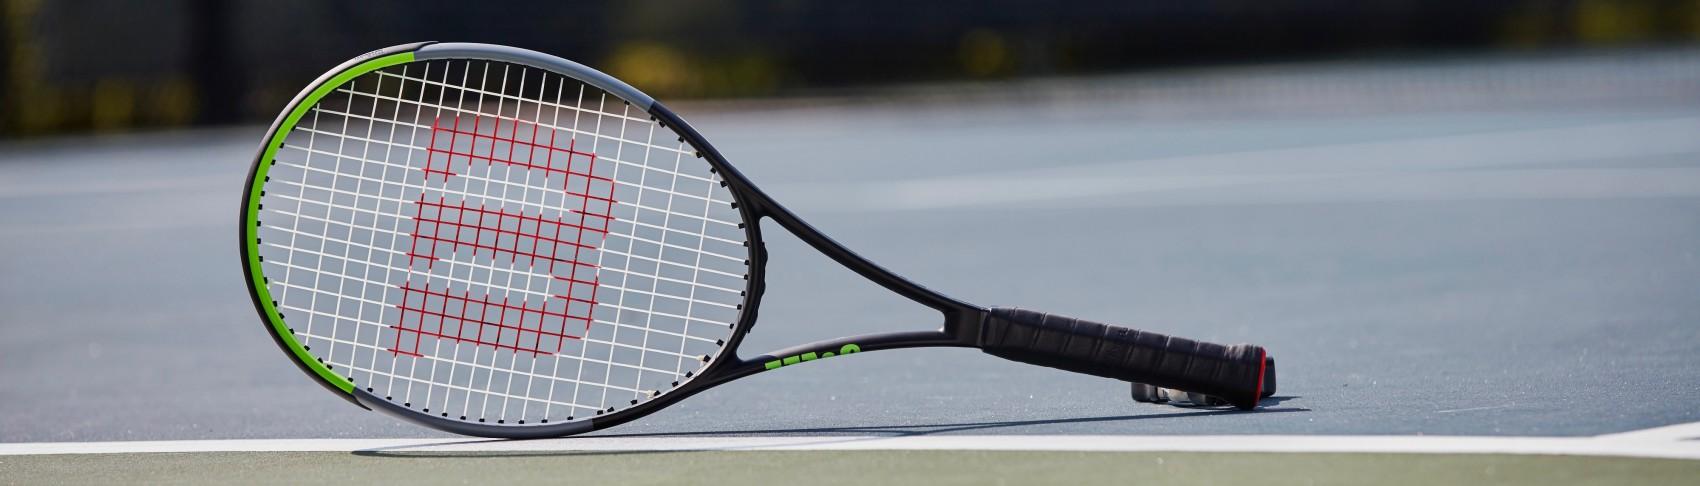 Tennisshort